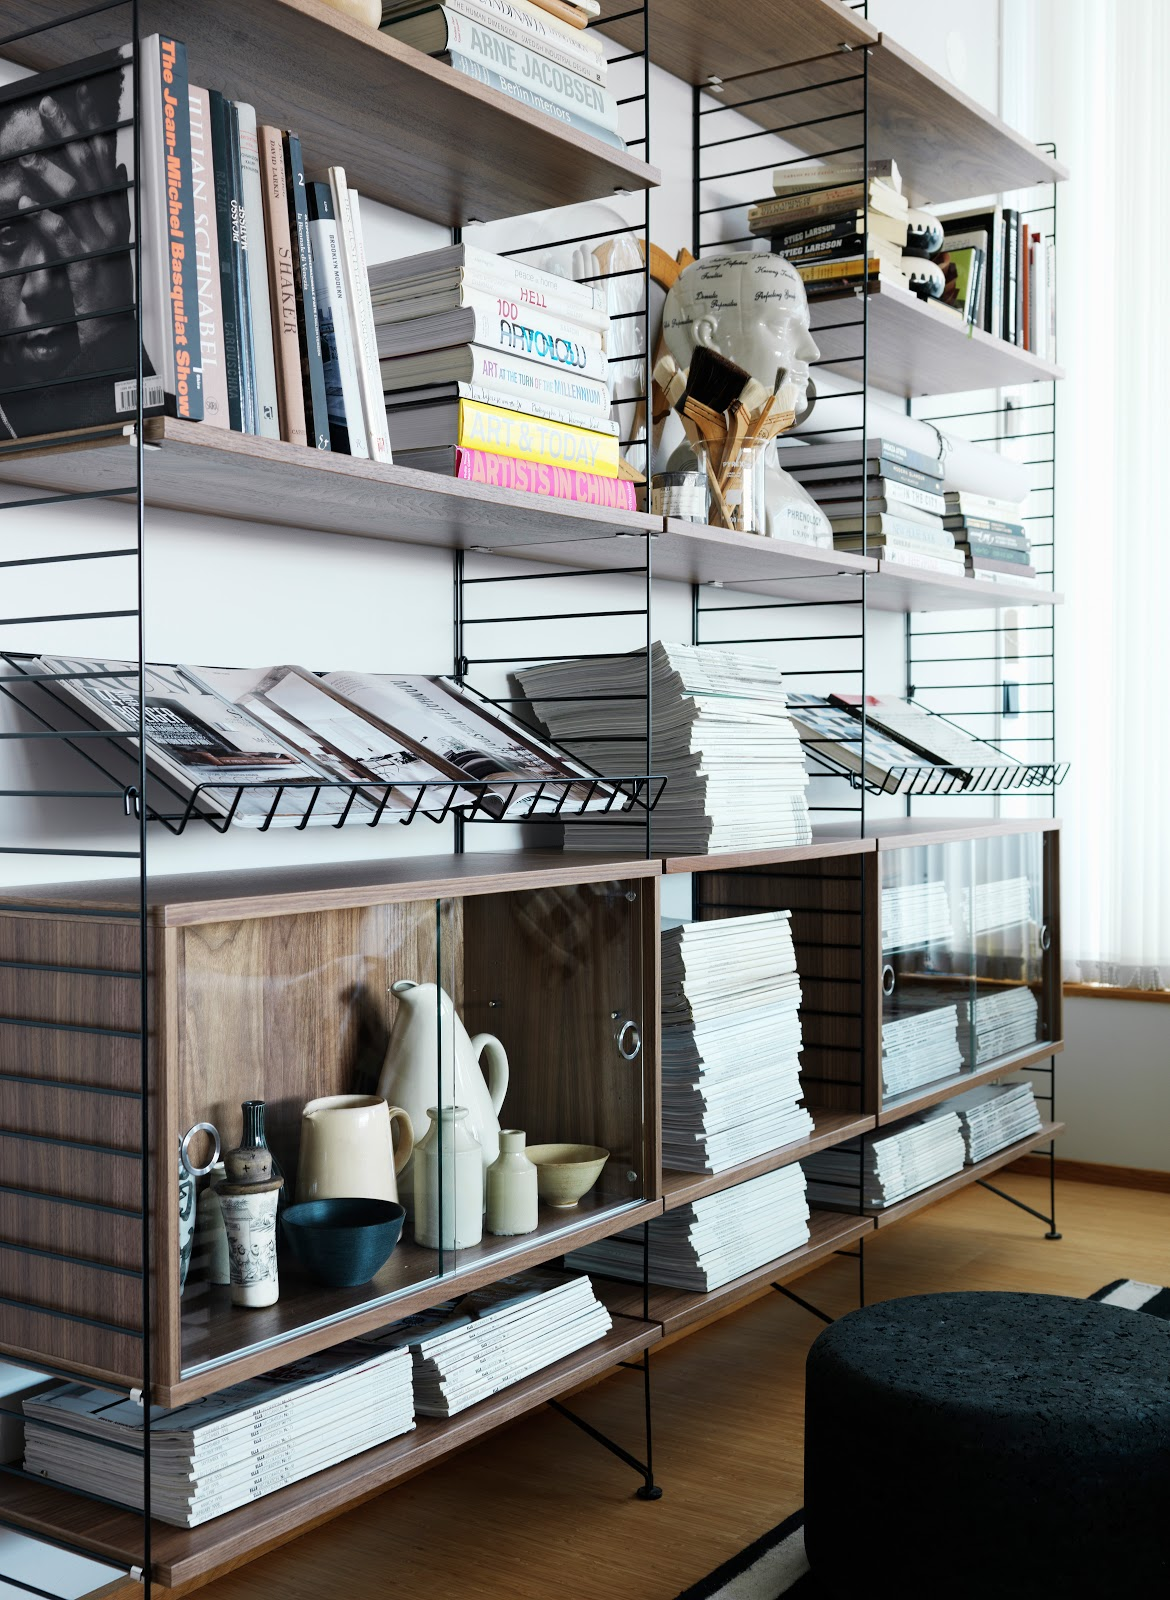 kreativa kvadrat ab weekly inspiration stringhyllan. Black Bedroom Furniture Sets. Home Design Ideas